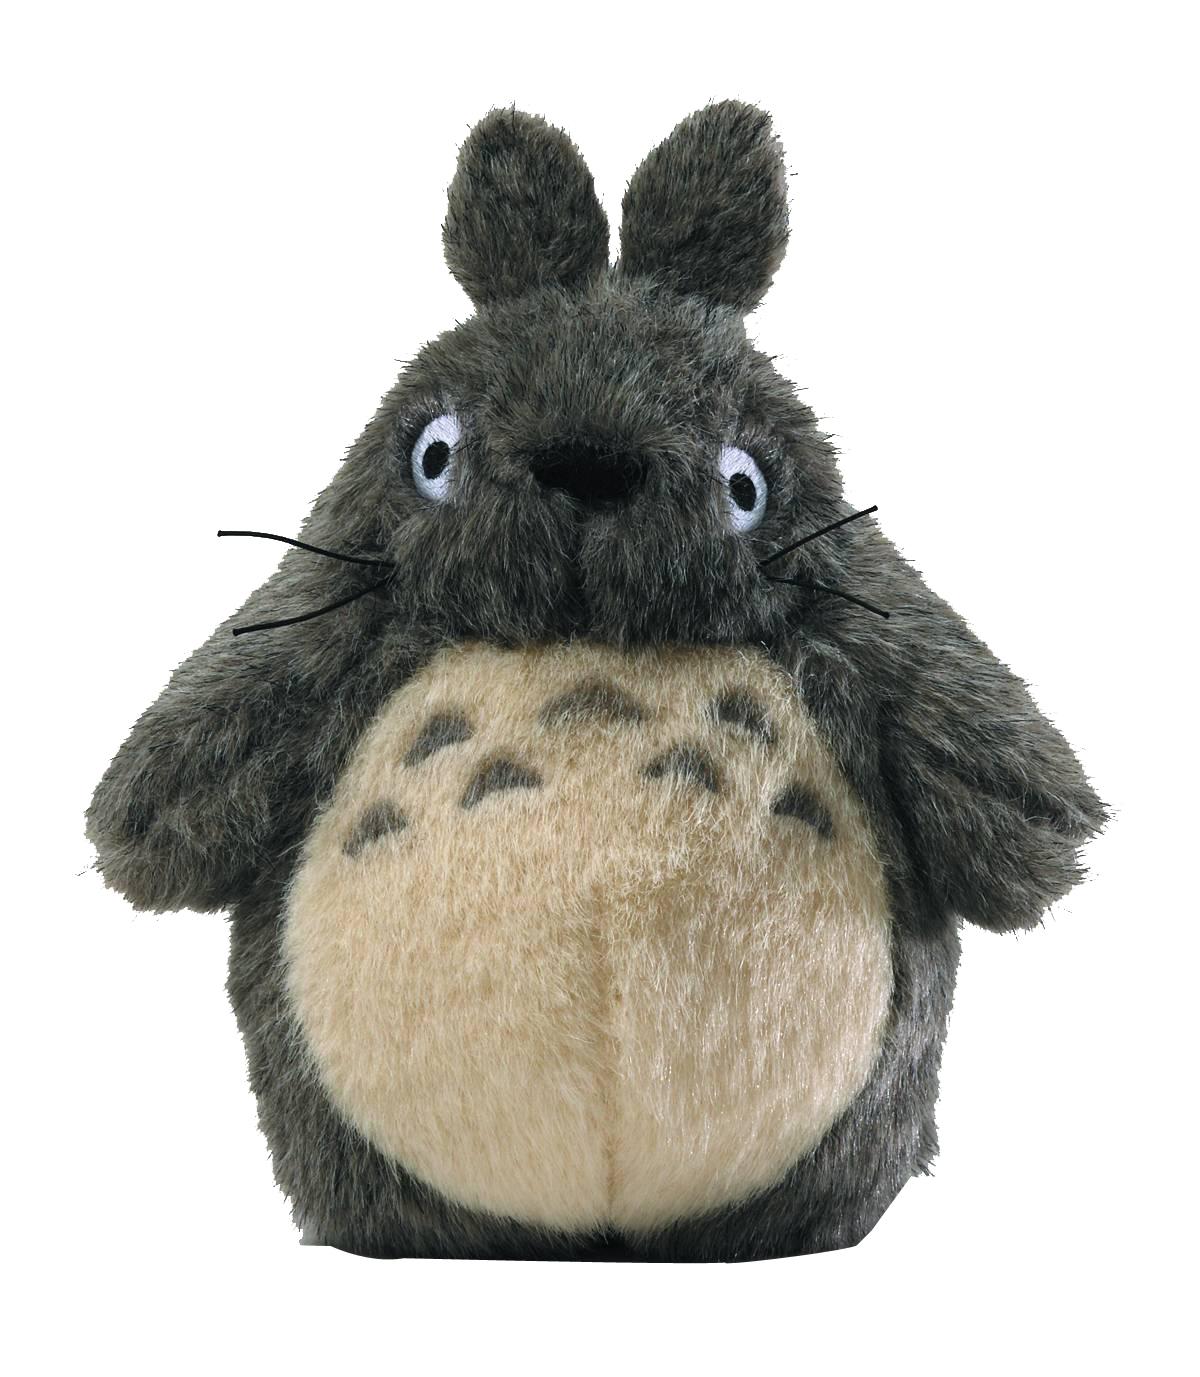 Totoro peluche réplique 18cm